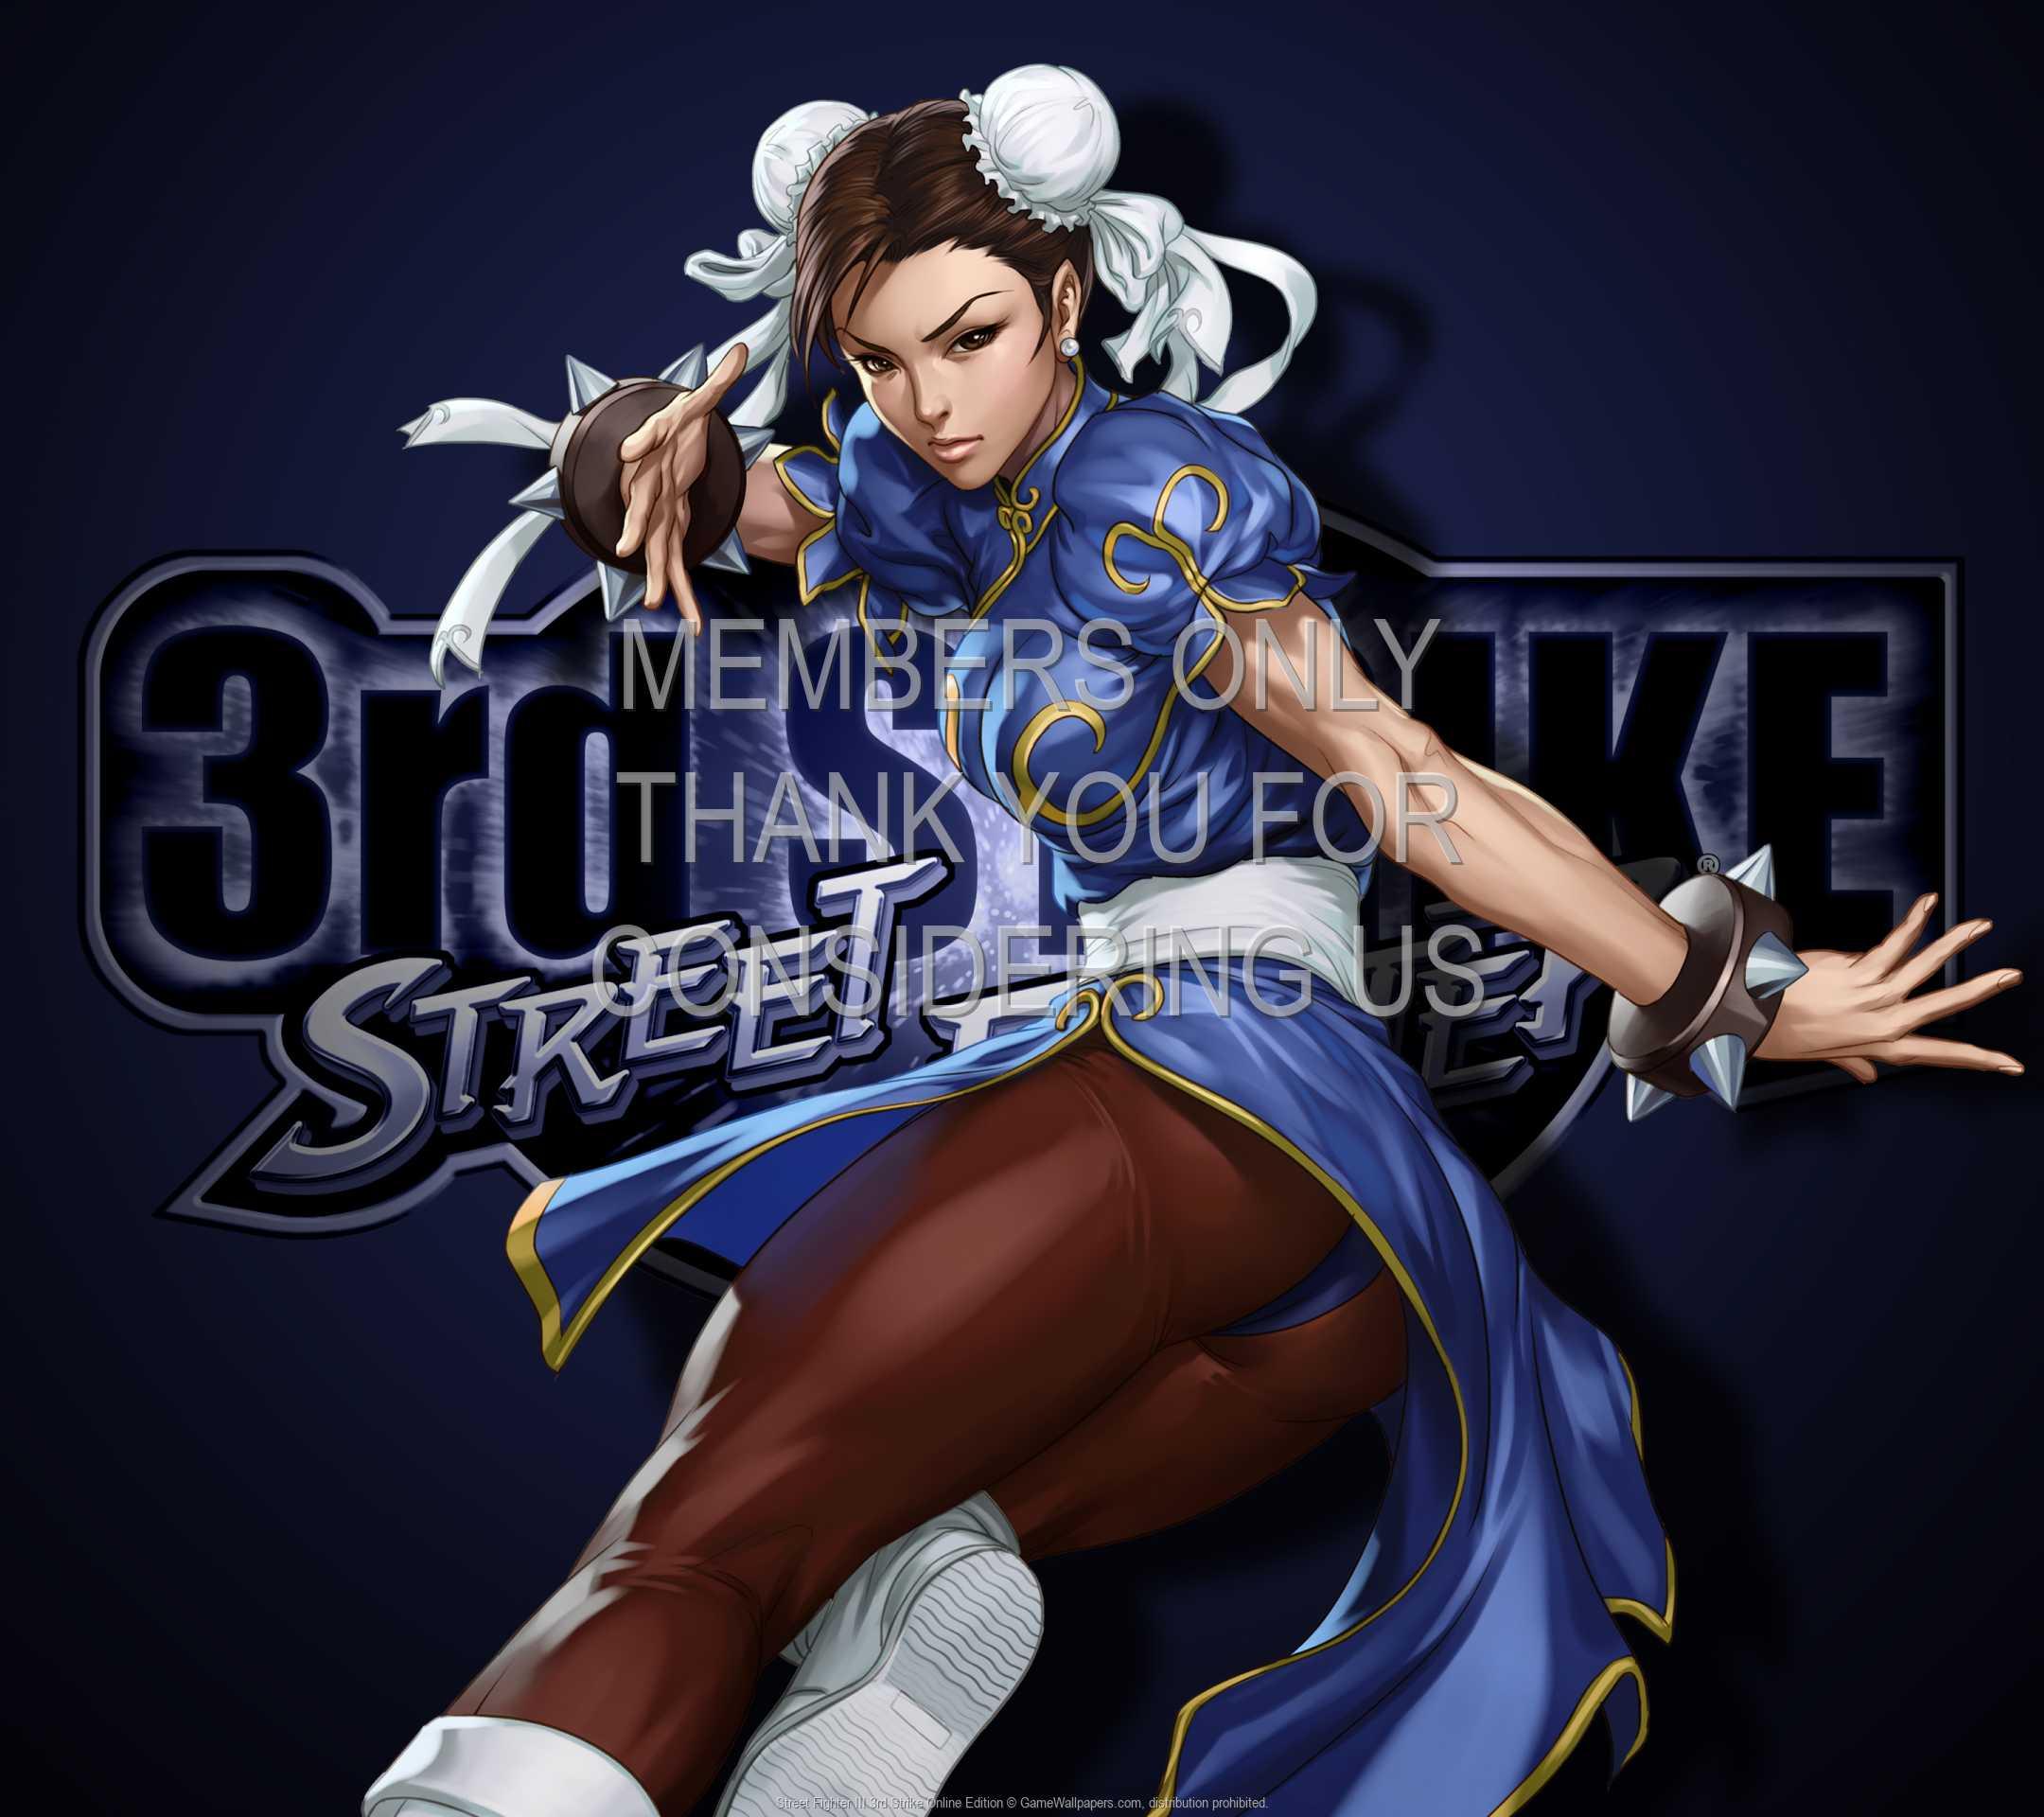 Street Fighter III: 3rd Strike Online Edition 1080p Horizontal Mobiele achtergrond 01